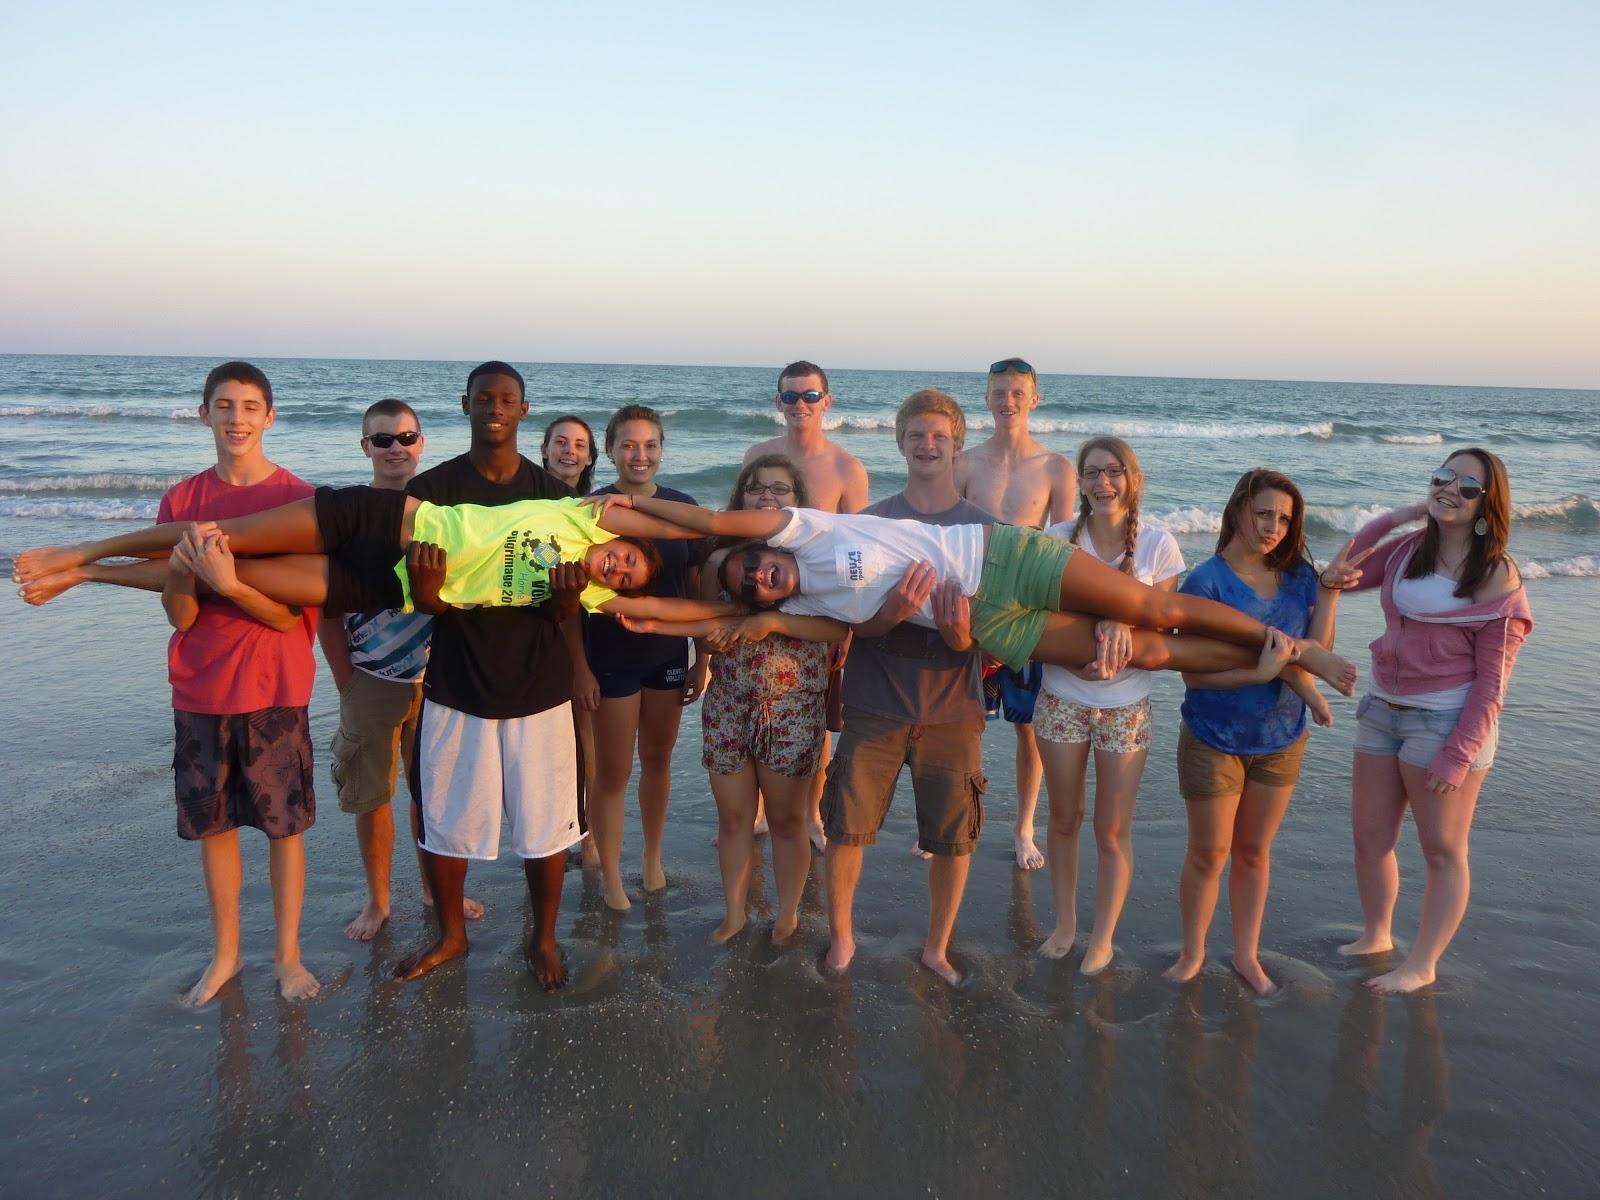 Brad Lopp The 10th 11th Grade Small Group Beach Trip Was Fantastic